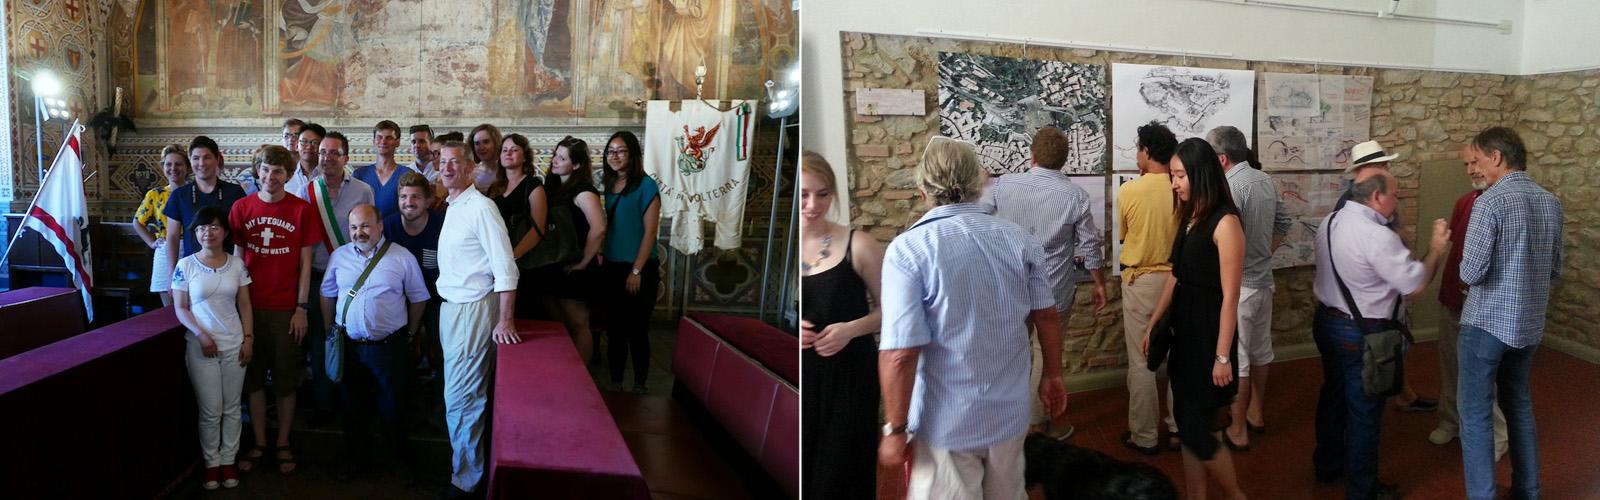 2015_Volterra_Workshop_image2